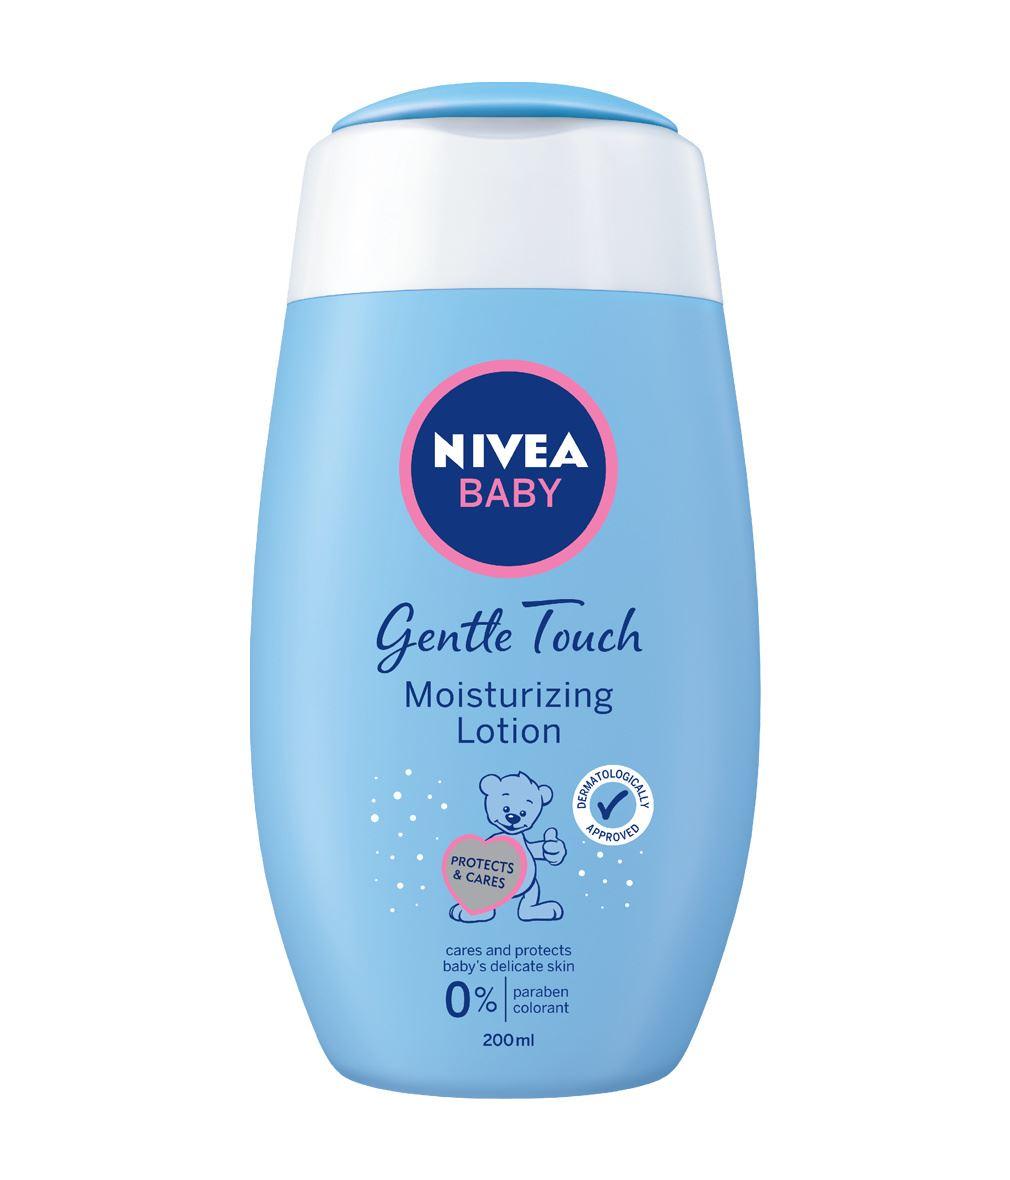 Nivea baby moisturizing lotion mild touch